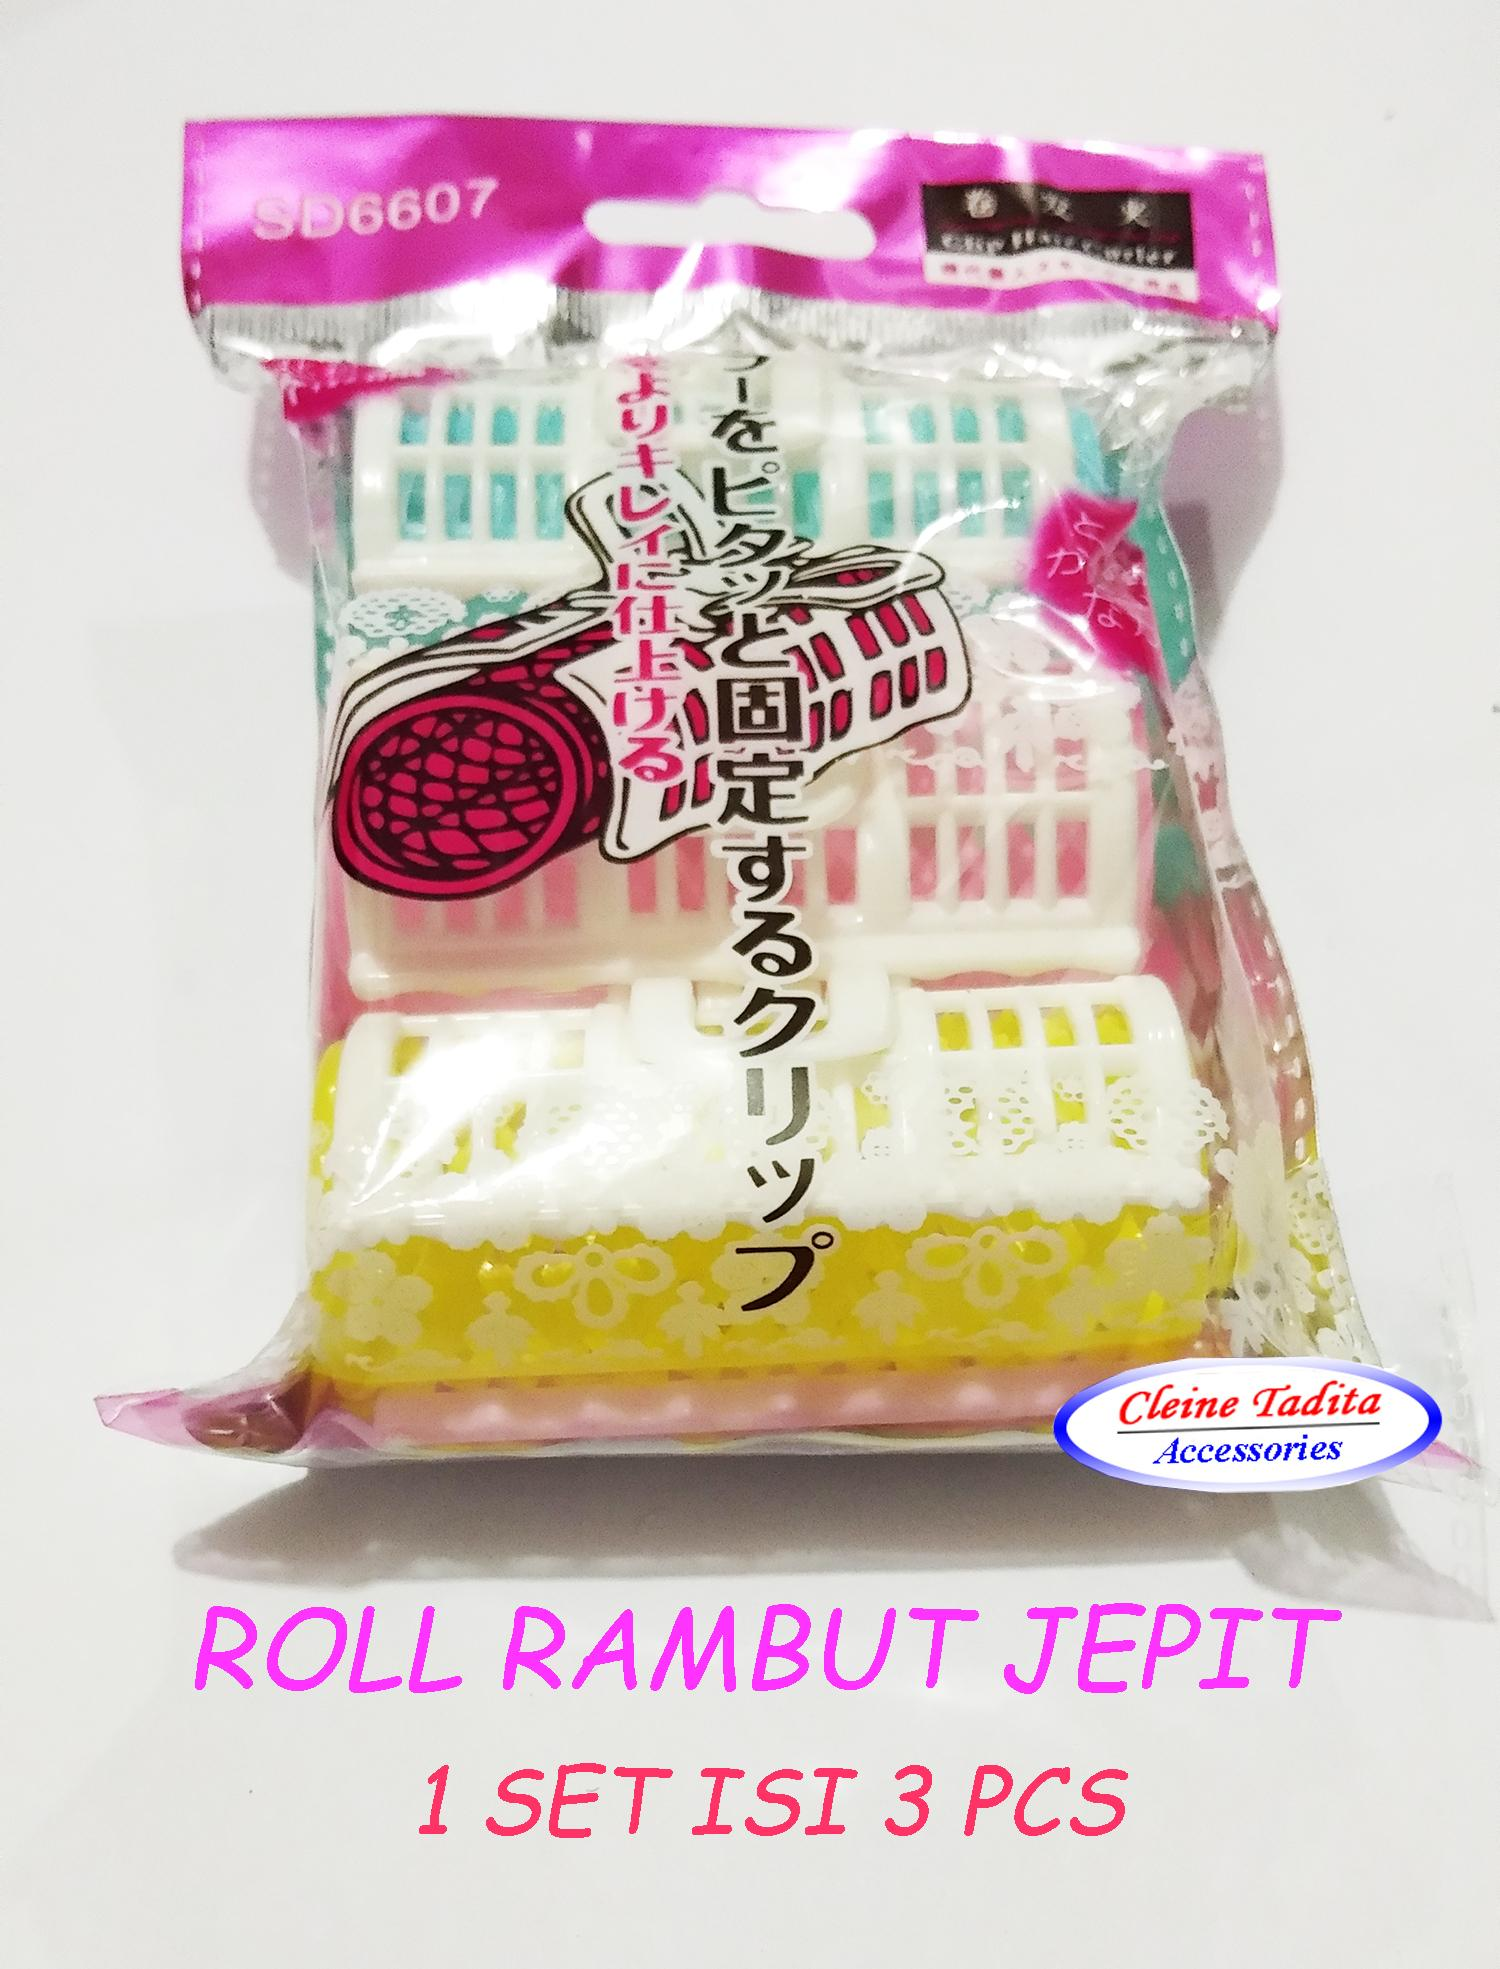 Detail Gambar Roll Rambut Jepit (1 set isi 3 pcs) Terkini